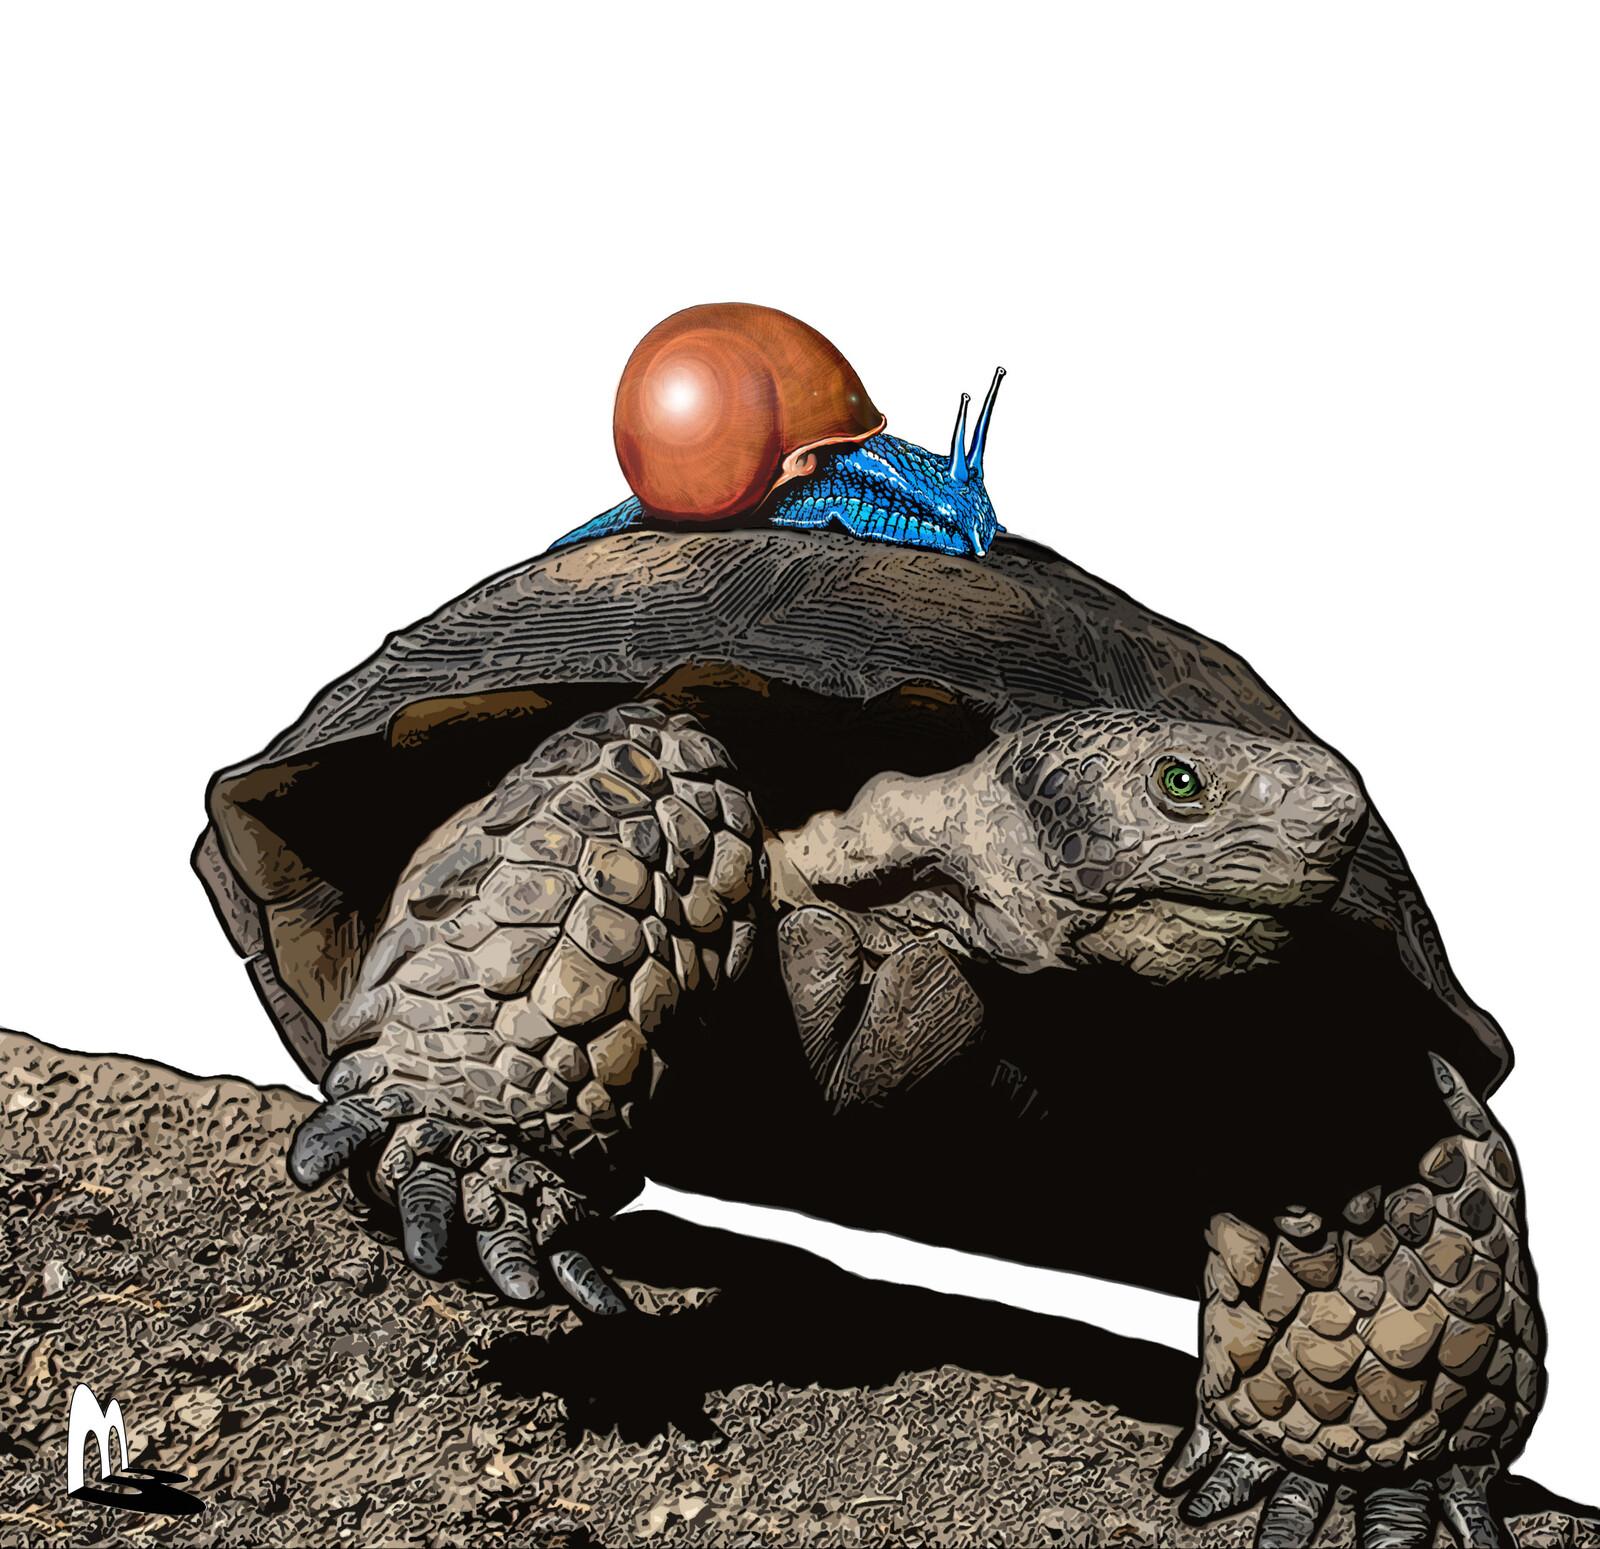 Snail riding a Turtle